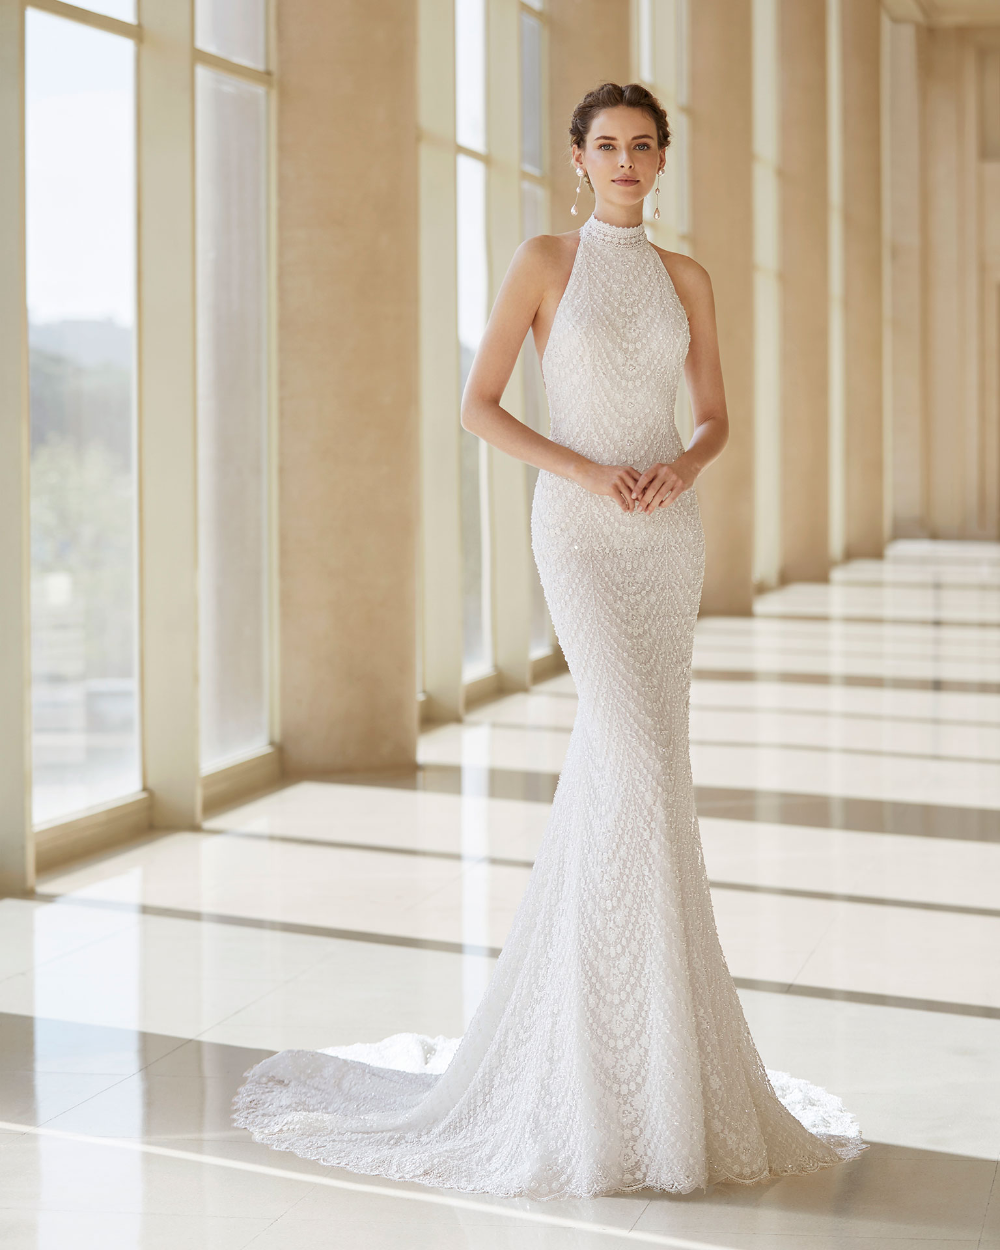 Selva Bridal 2020 Rosa Clara Couture Collection Figure Flattering Wedding Dress Halter Wedding Dress Flattering Wedding Dress